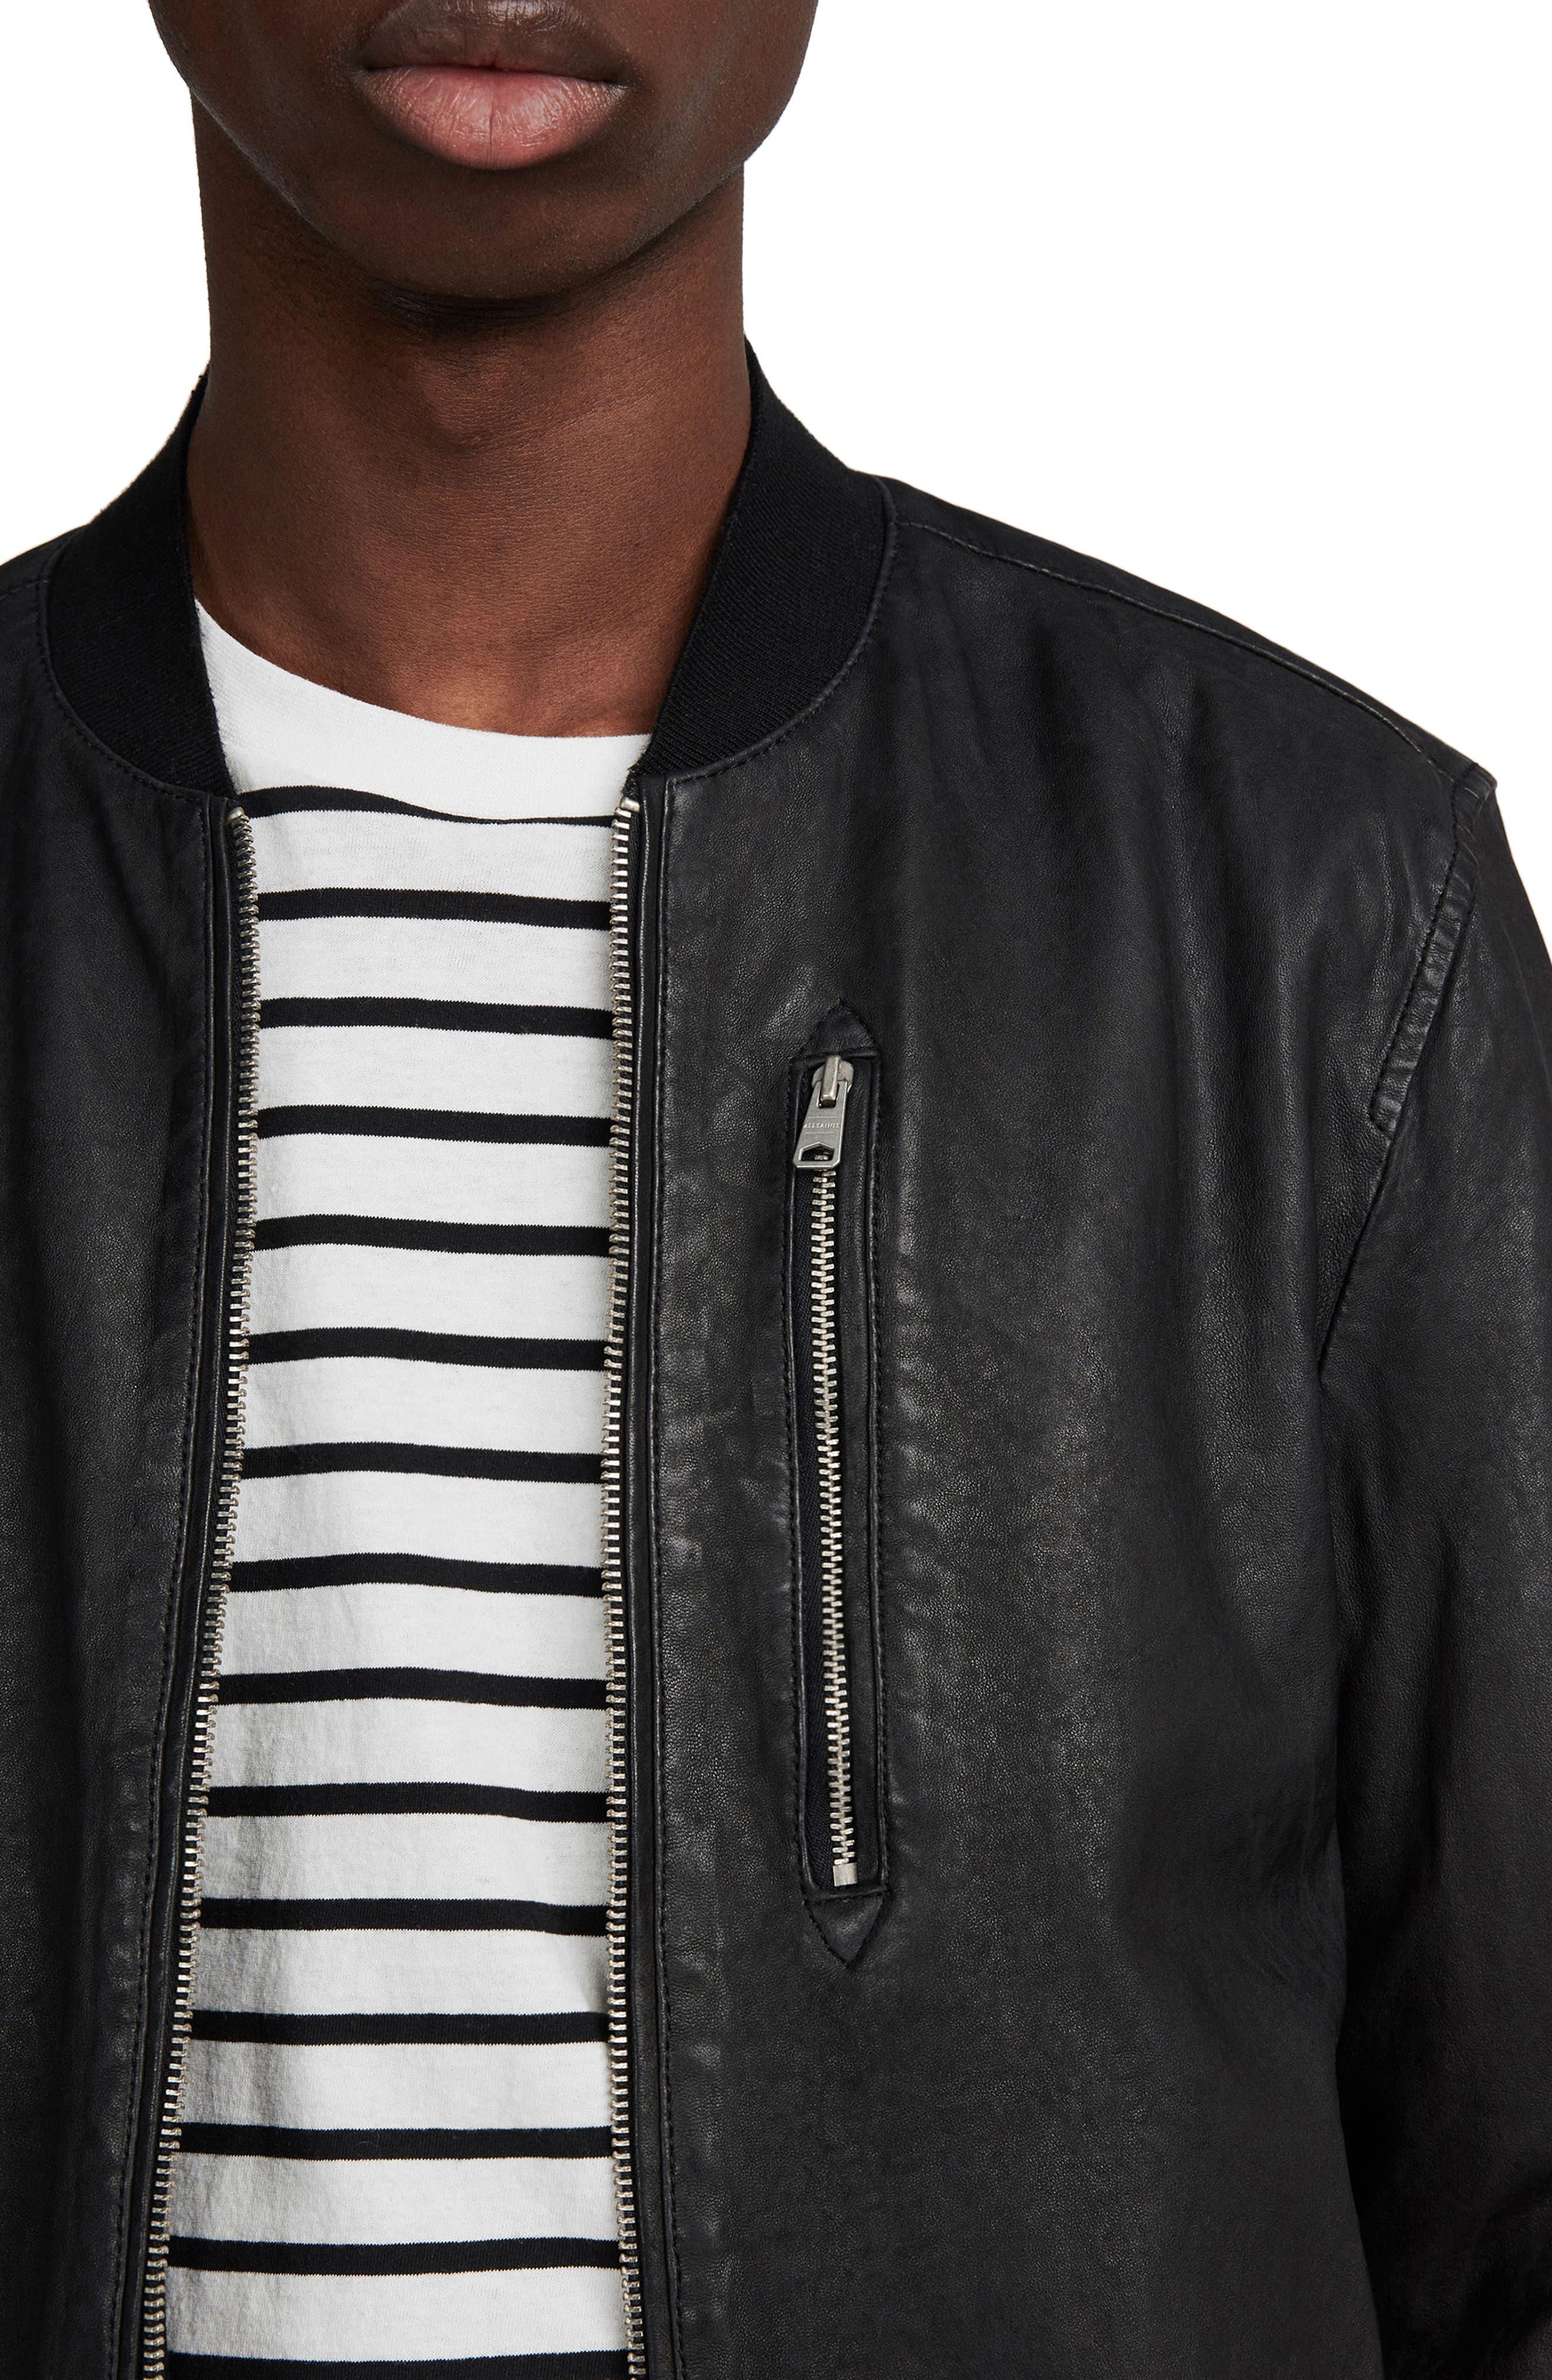 ALLSAINTS, Kino Leather Bomber Jacket, Alternate thumbnail 4, color, BLACK